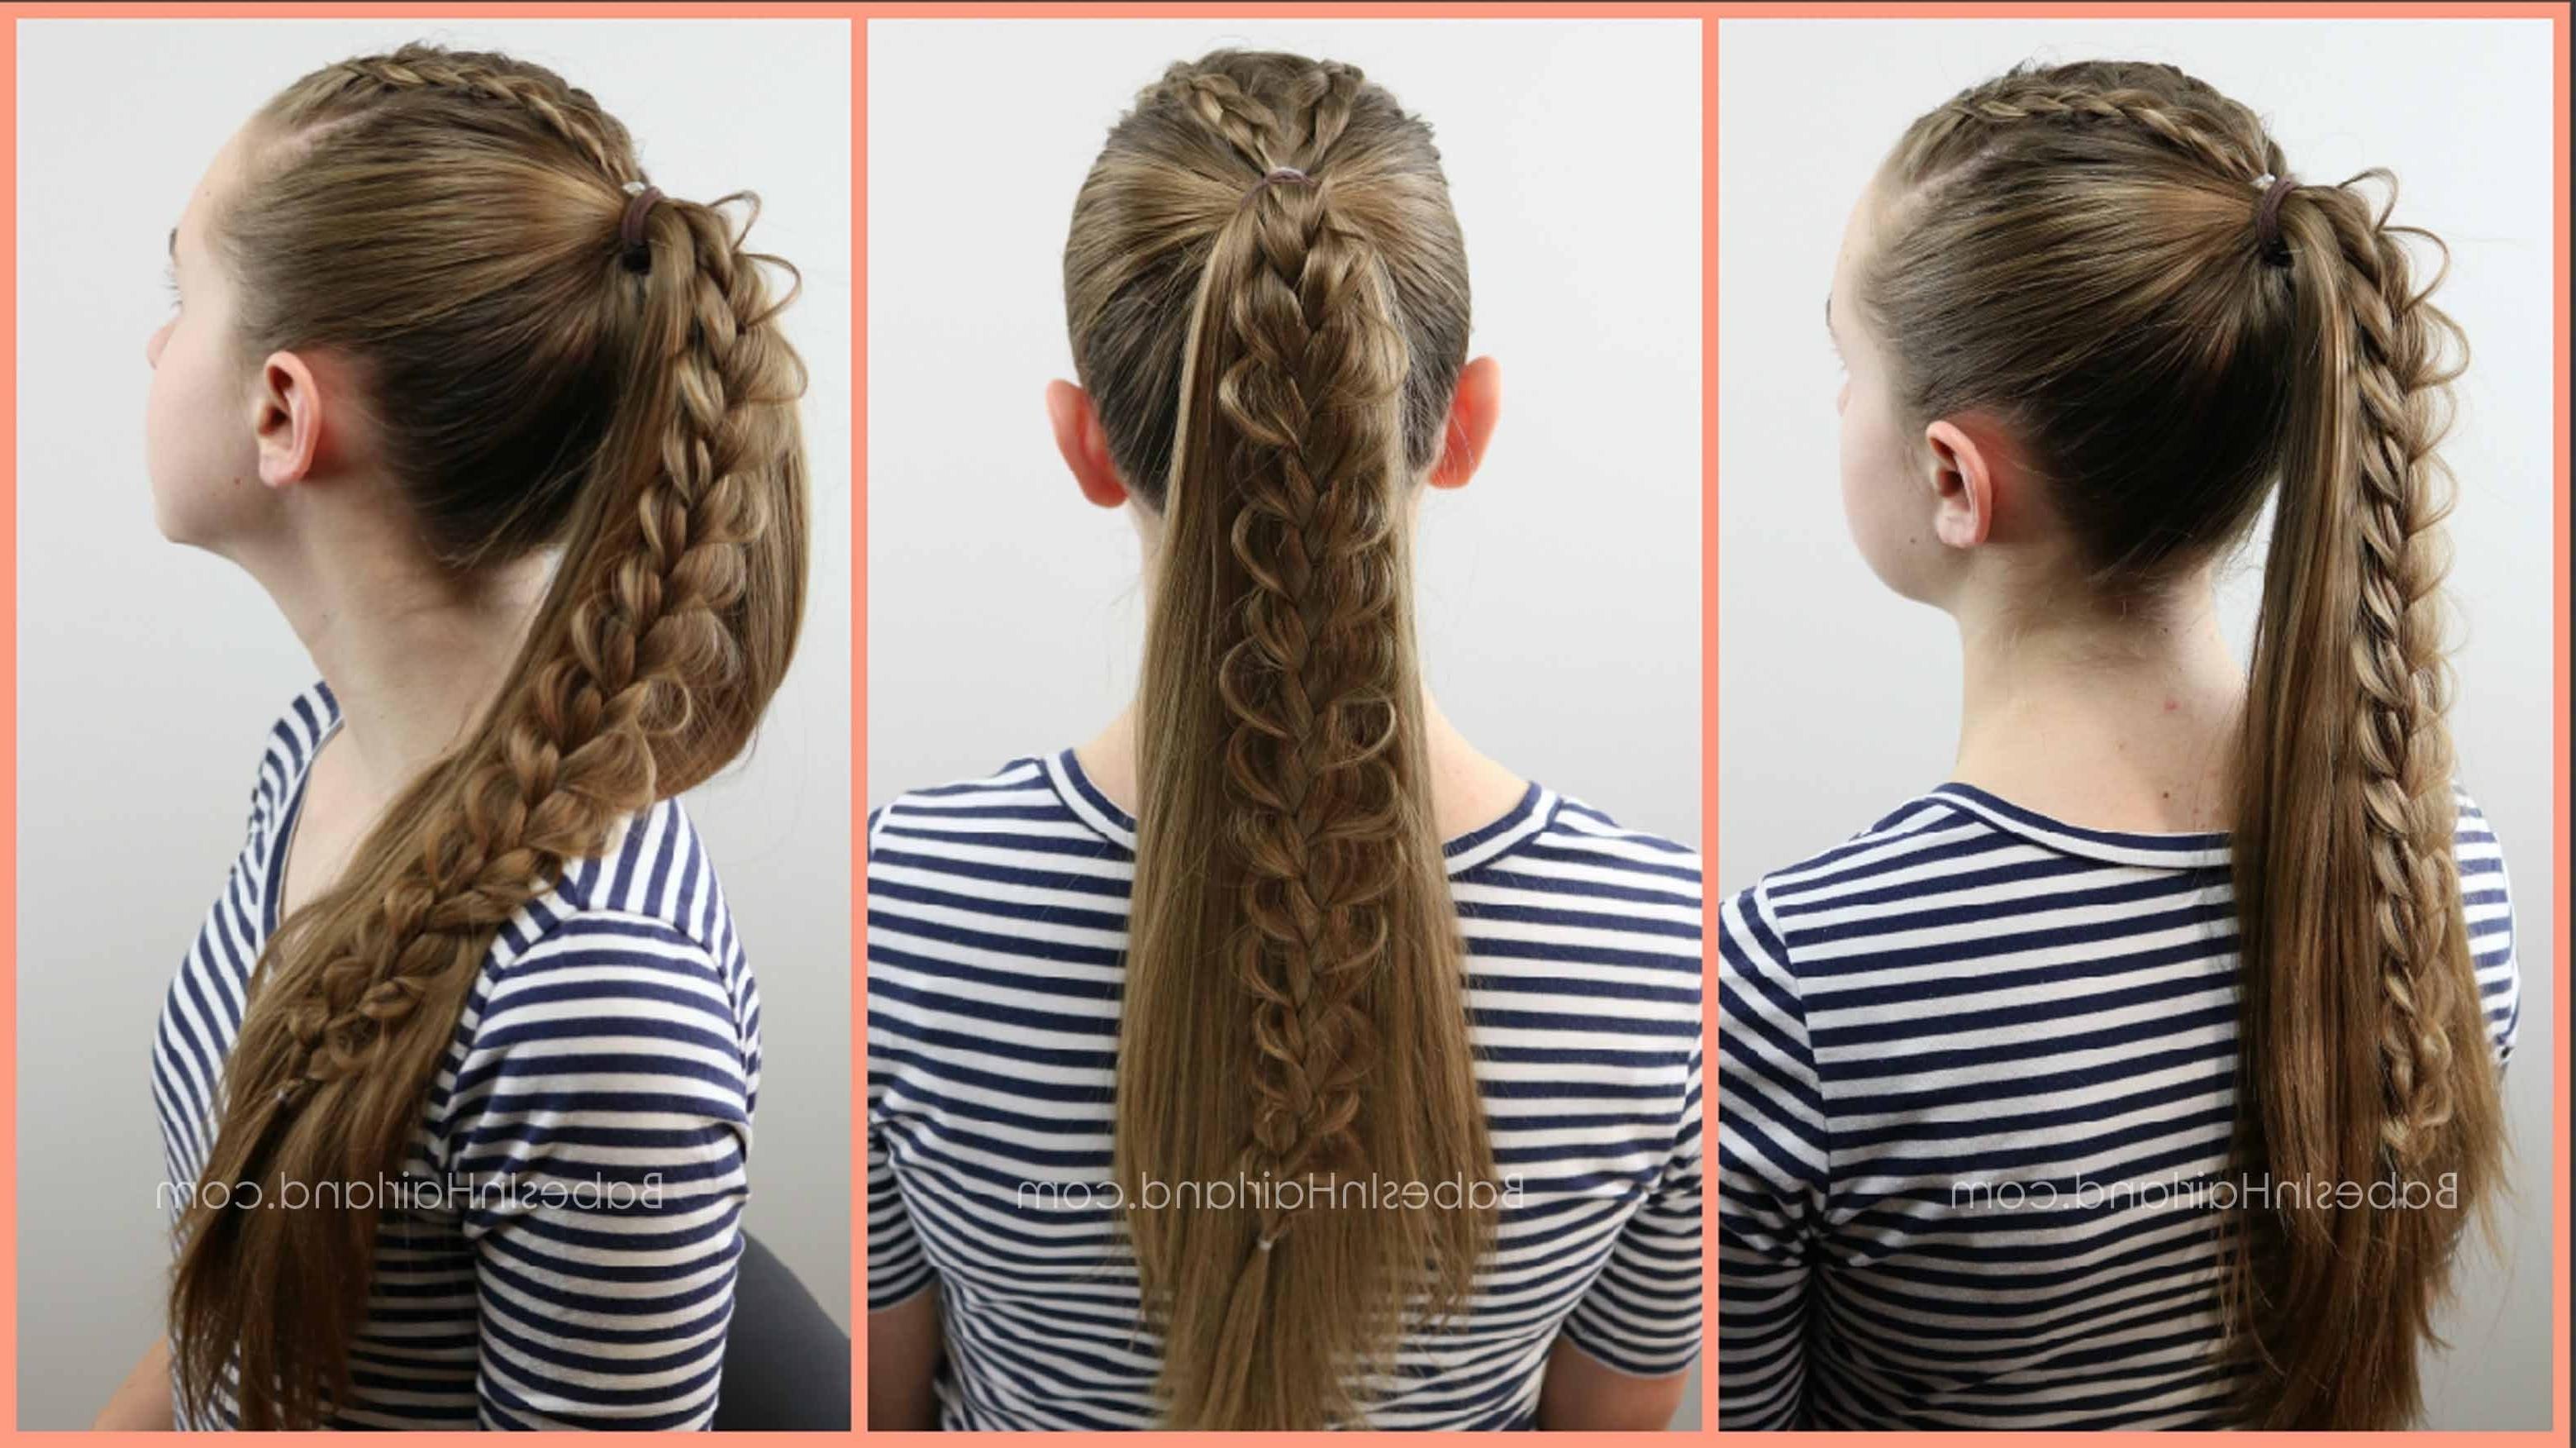 2 Dutch Braids 5 Different Hairstyles (View 1 of 15)